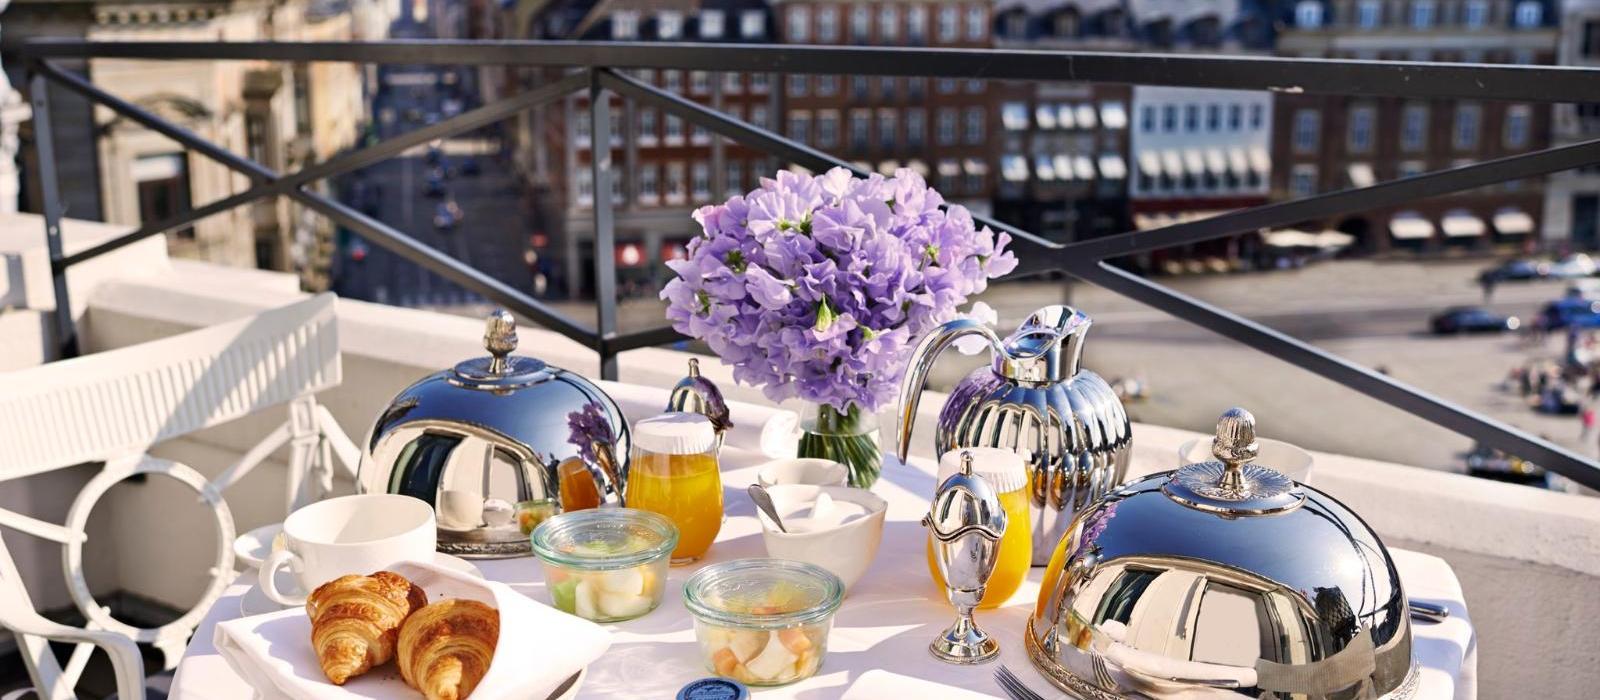 彤格乐豪华酒店(Hotel d'Angleterre) 早餐图片  www.lhw.cn